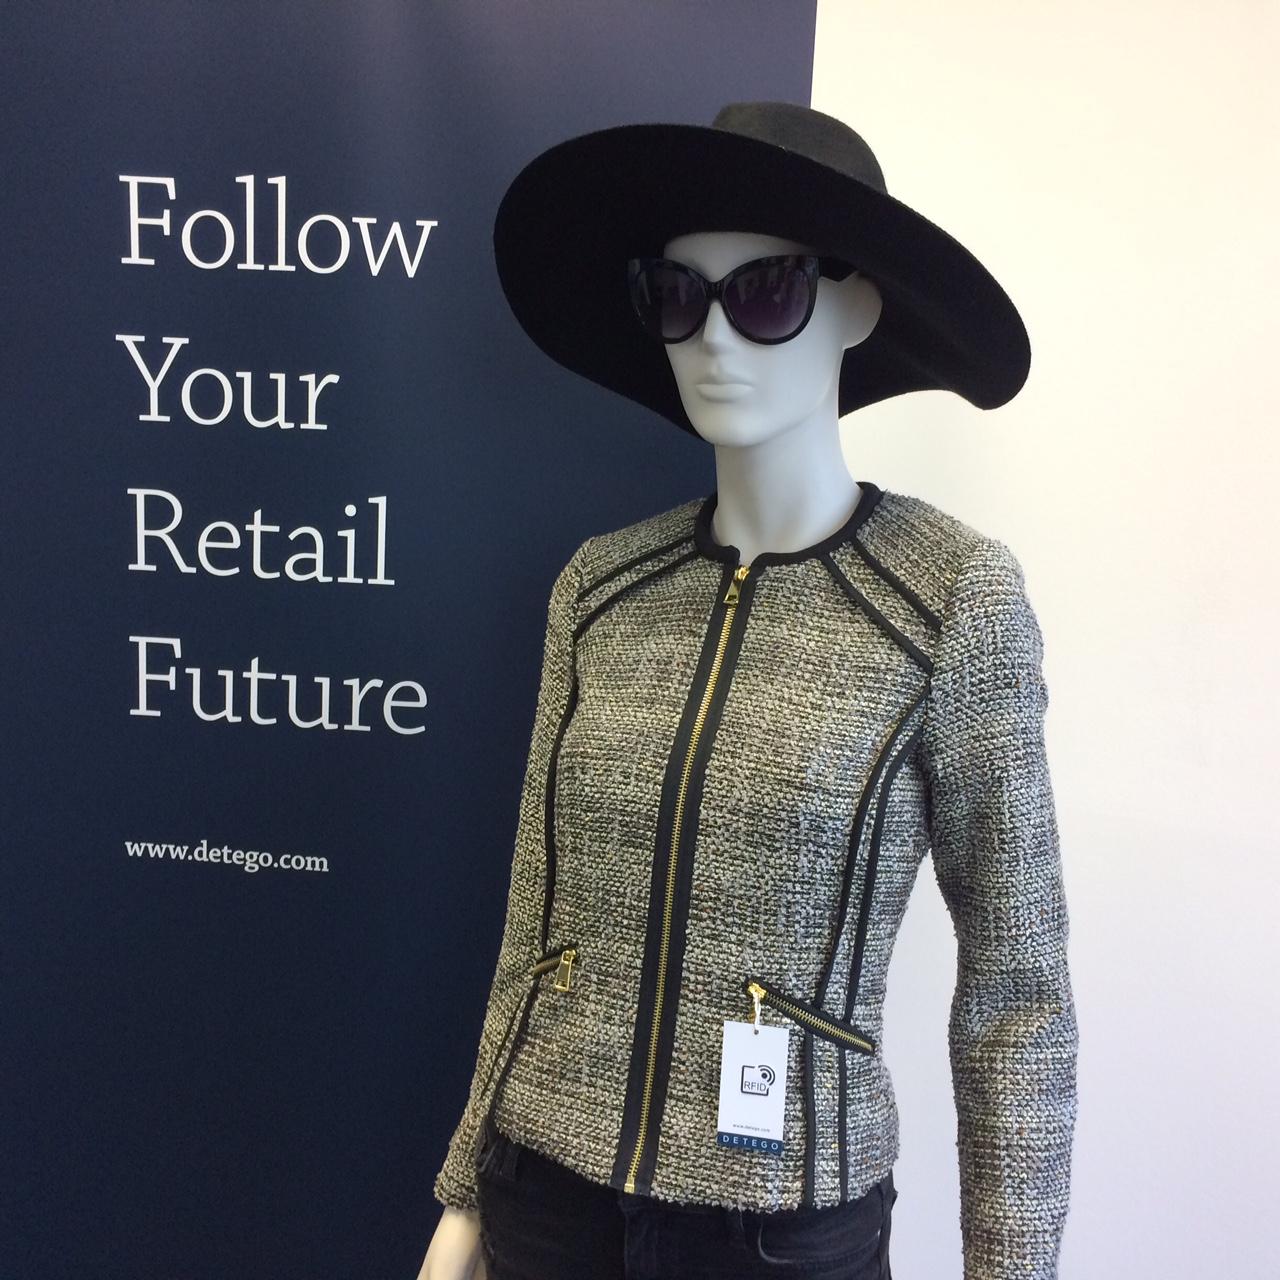 © Detego/ RFID im Modehandel